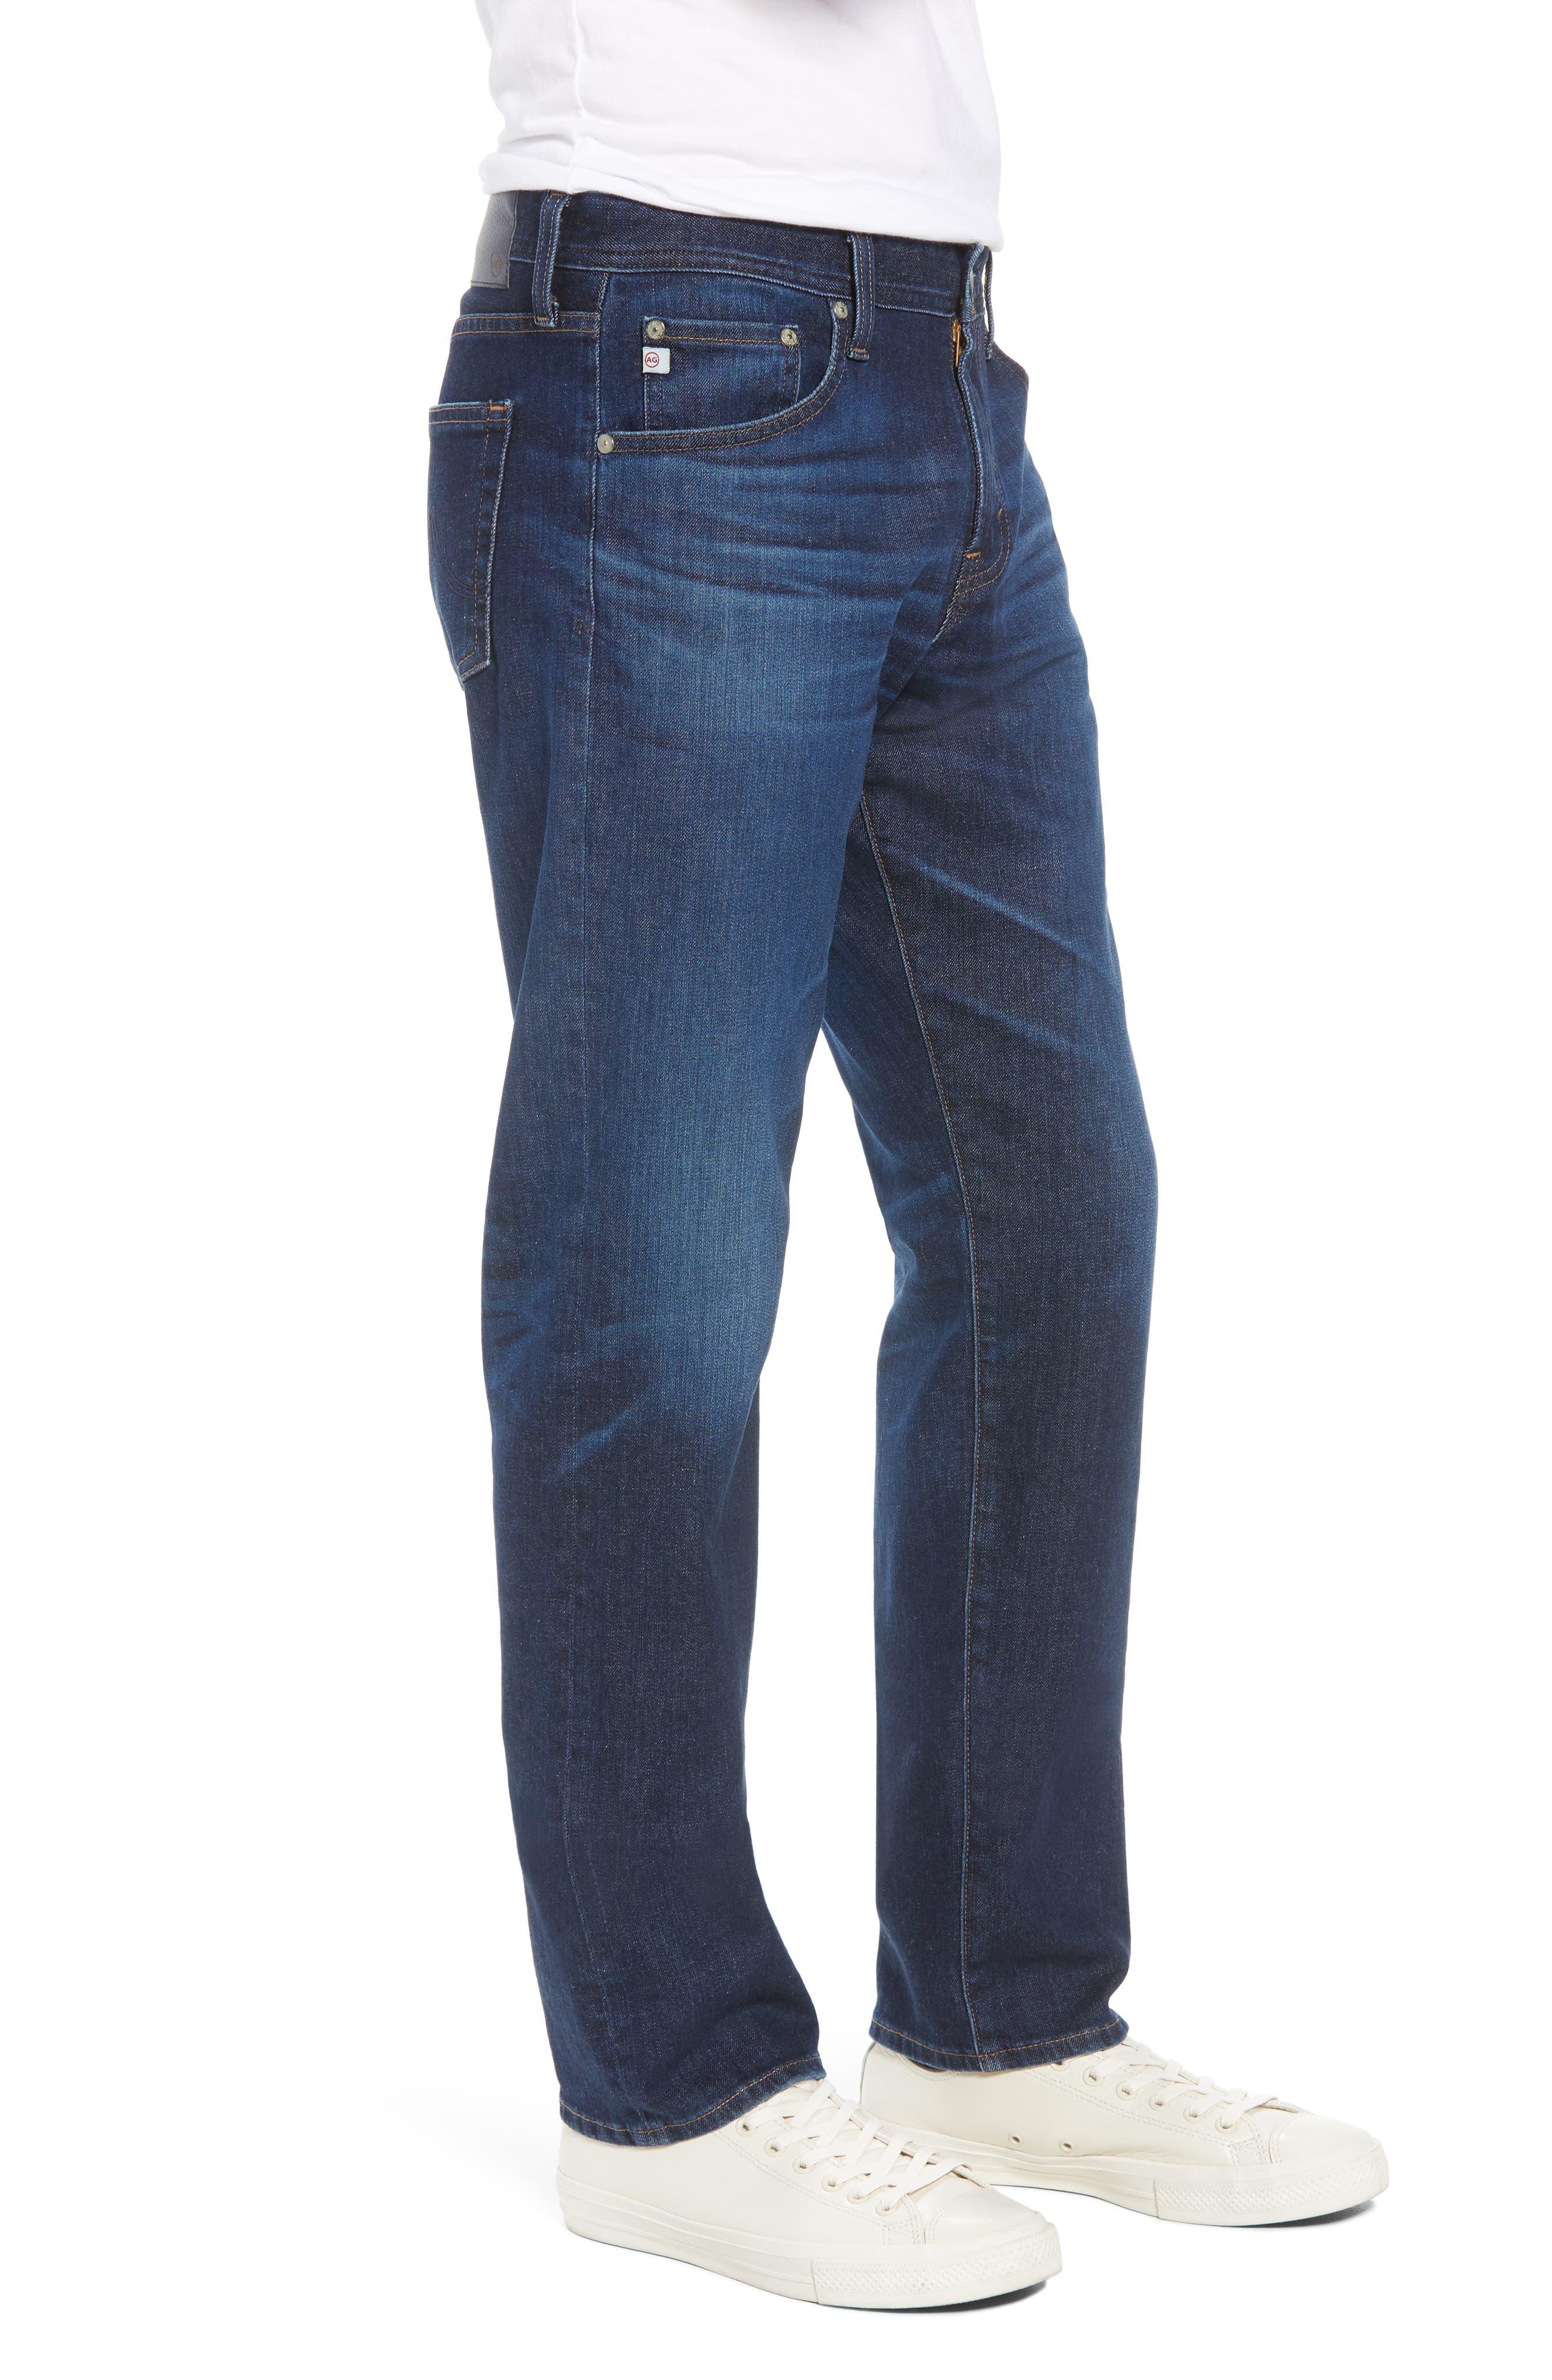 Graduate Slim Straight Fit Jeans,                             Alternate thumbnail 3, color,                             5 Years Lost Coast